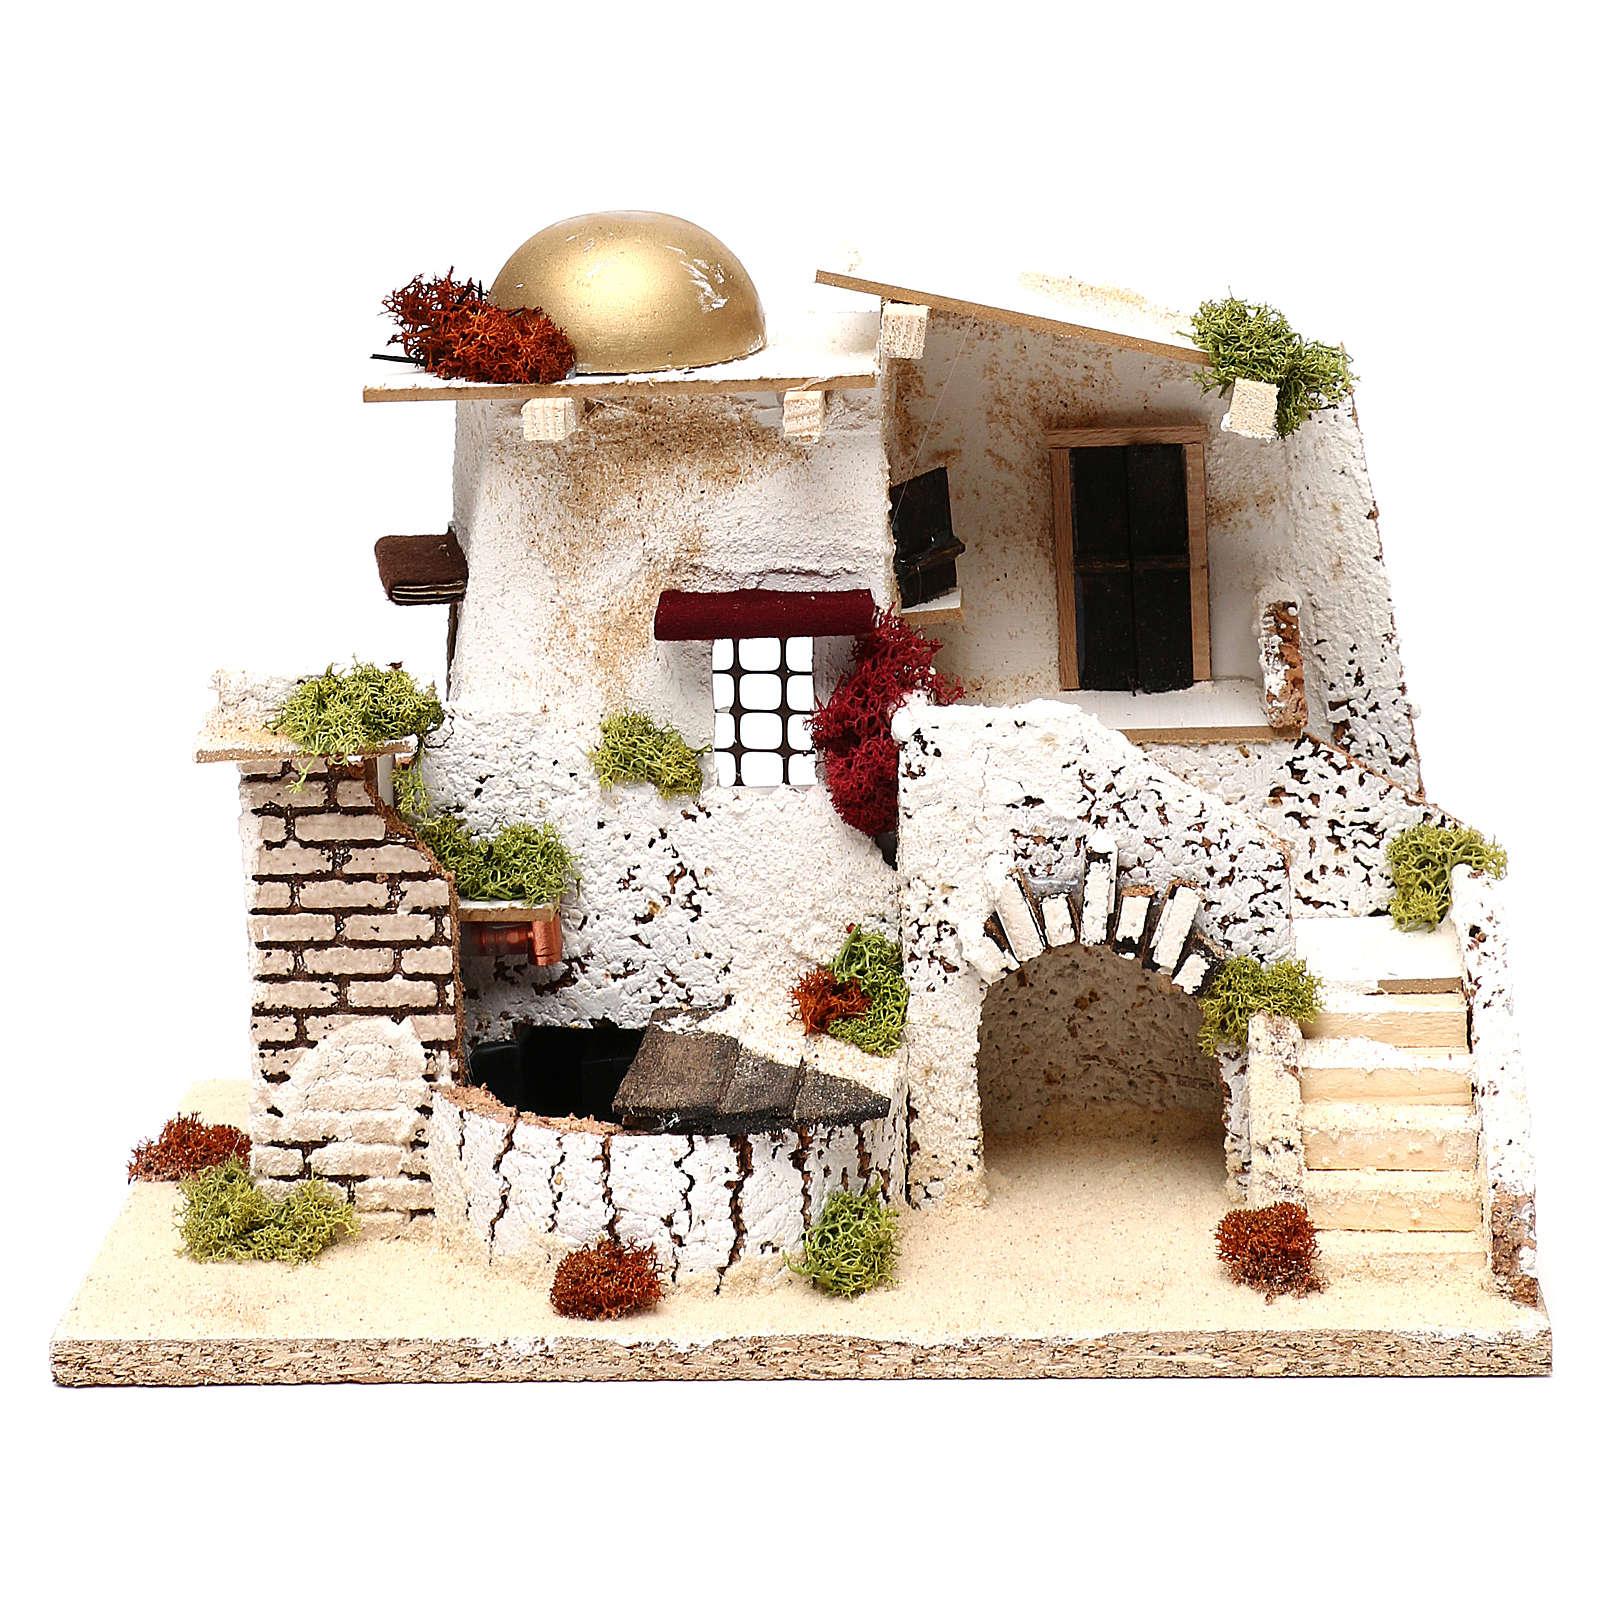 Casa stile arabo cupola dorata fontana funzionante 25x35x20 cm presepi 7 cm 4